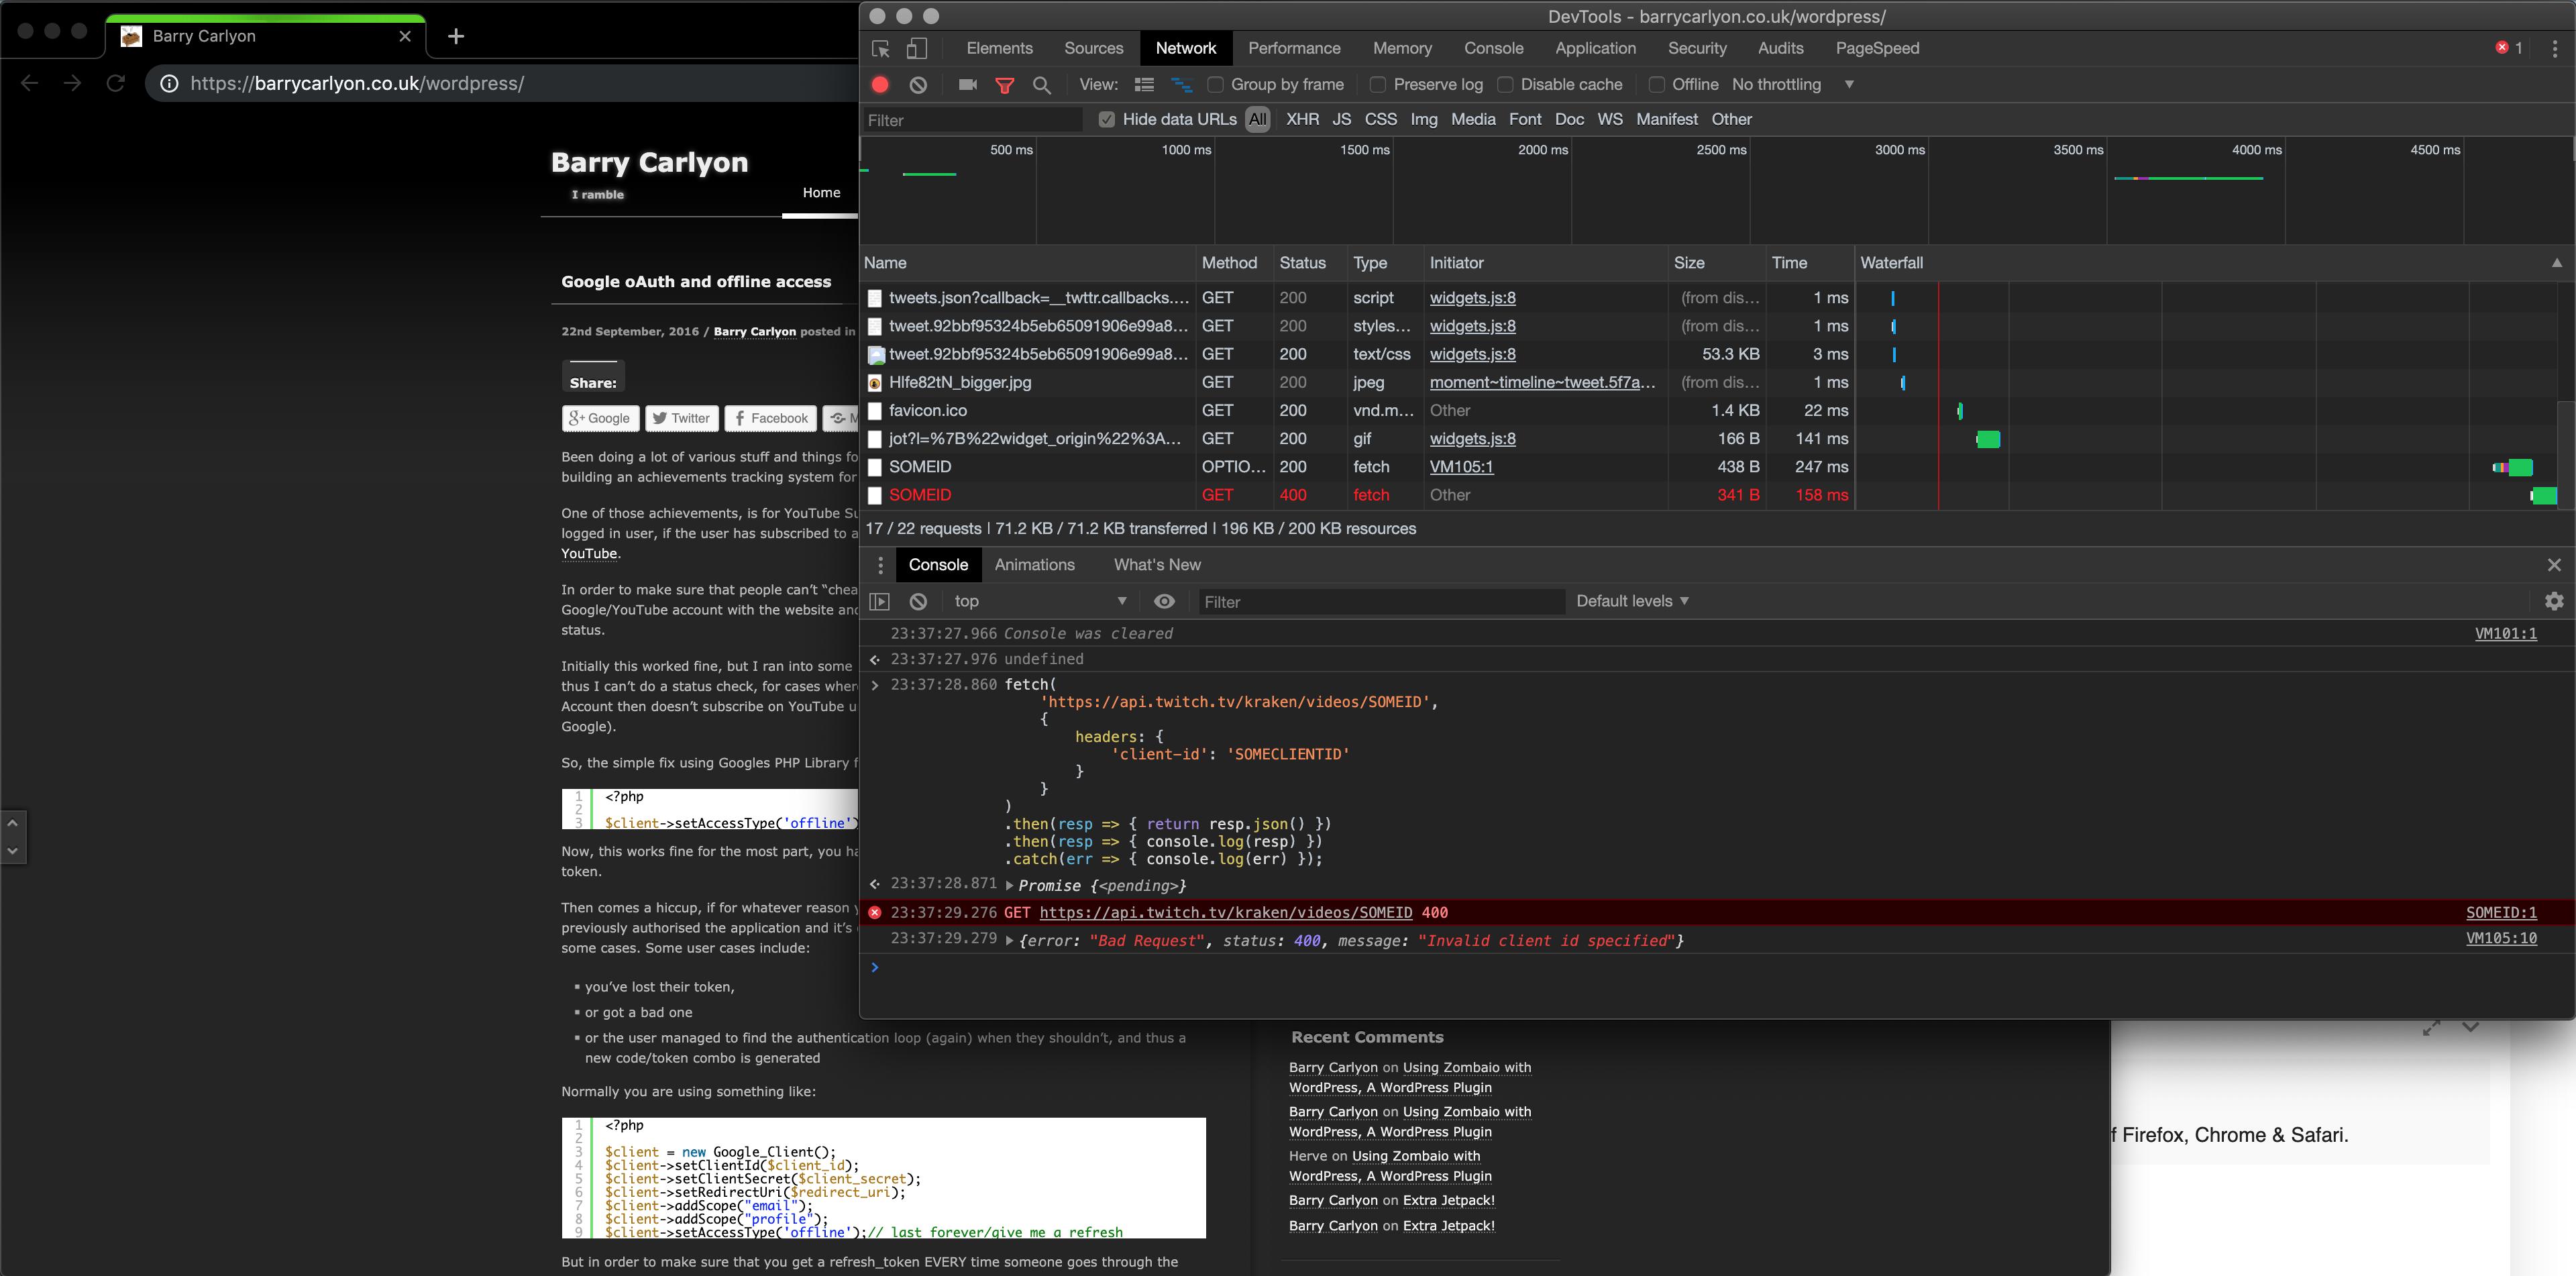 CORS - Wrong 'Access-Control-Allow-Origin' header - API - Twitch